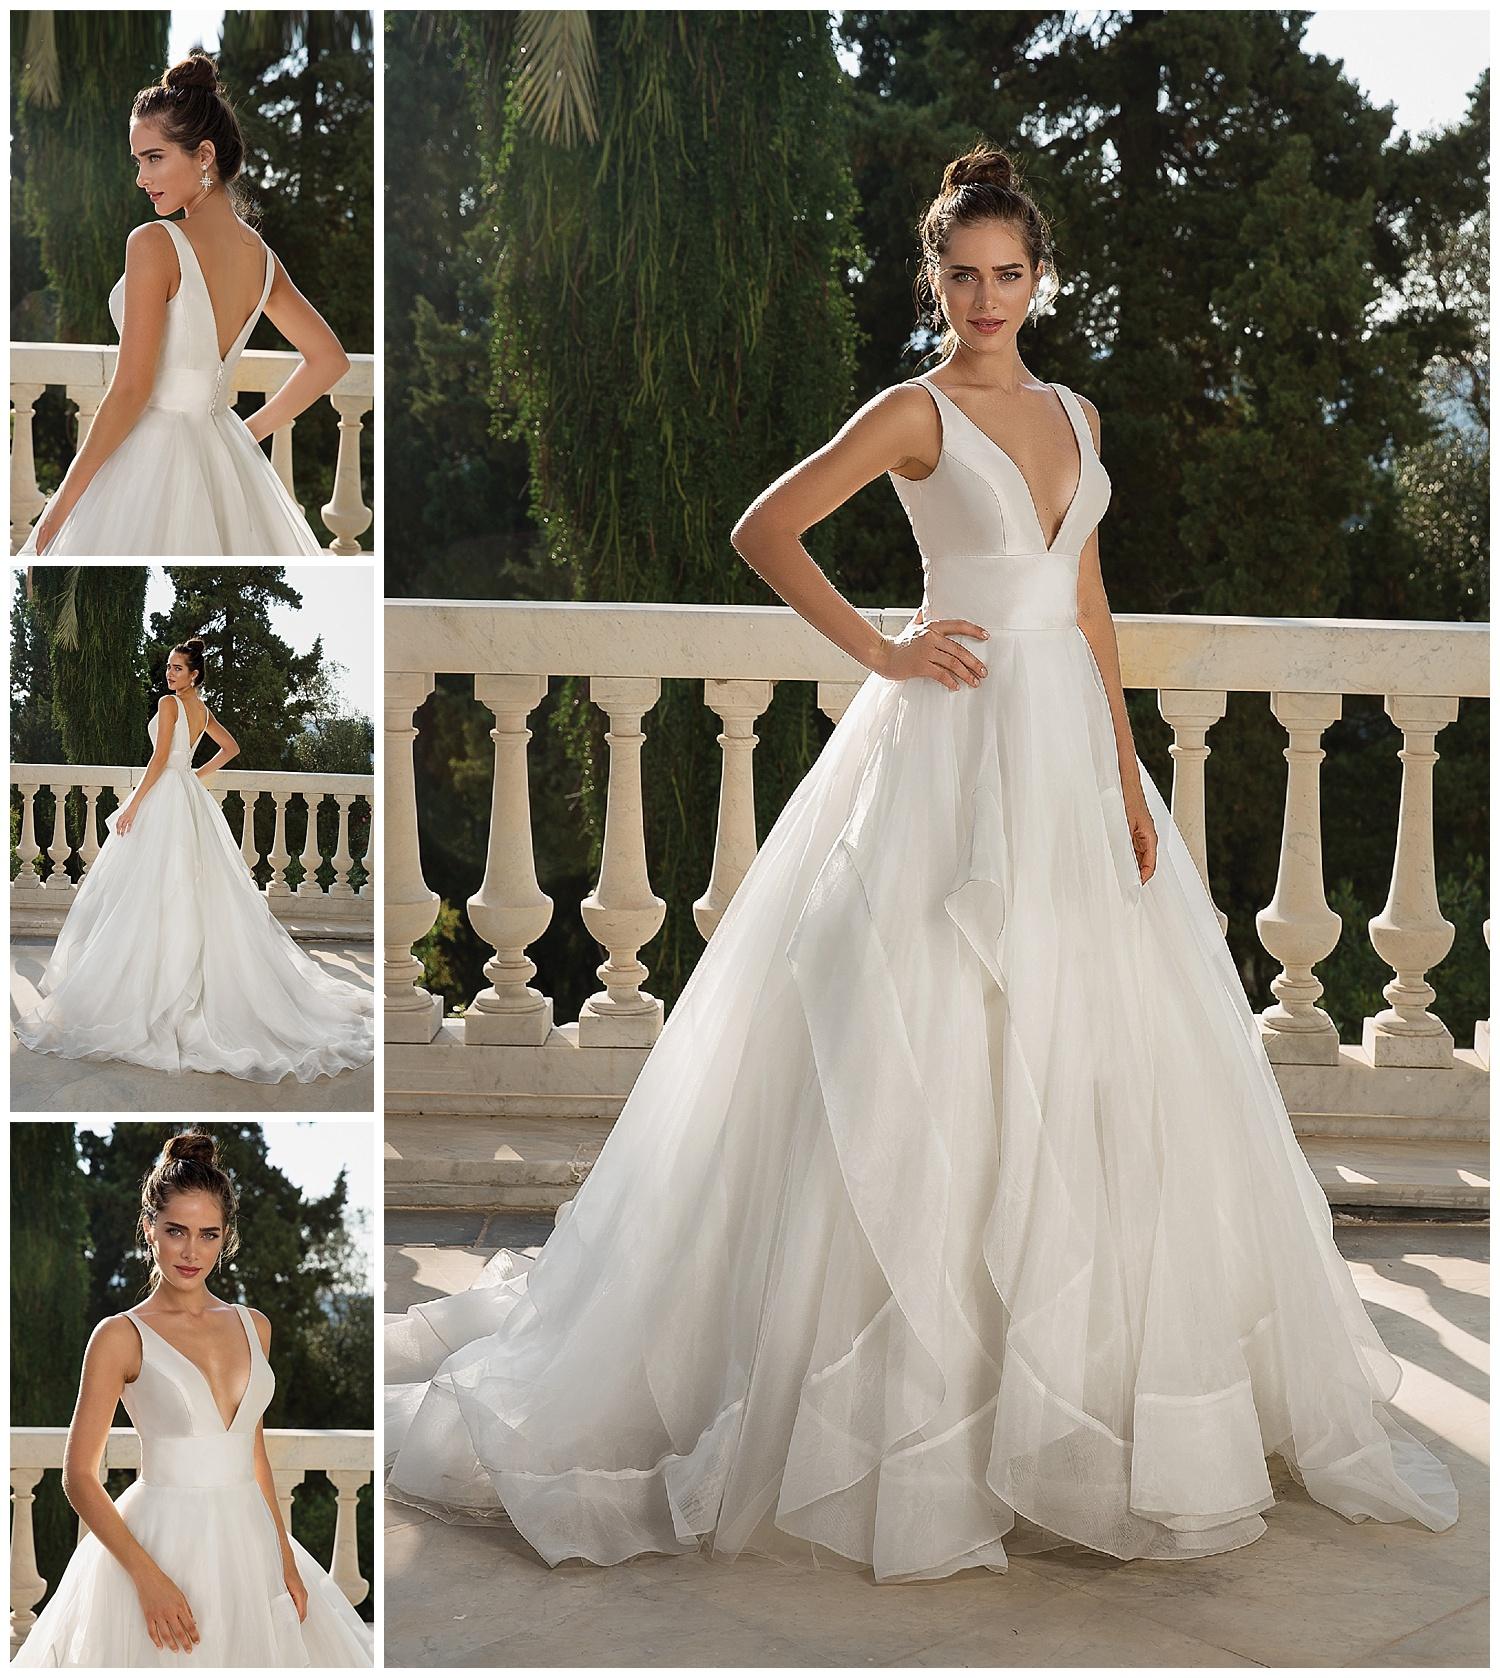 justin-alexander-88093-tulle-ballgown-wedding-dress-epiphany-boutique-carmel-california.jpg